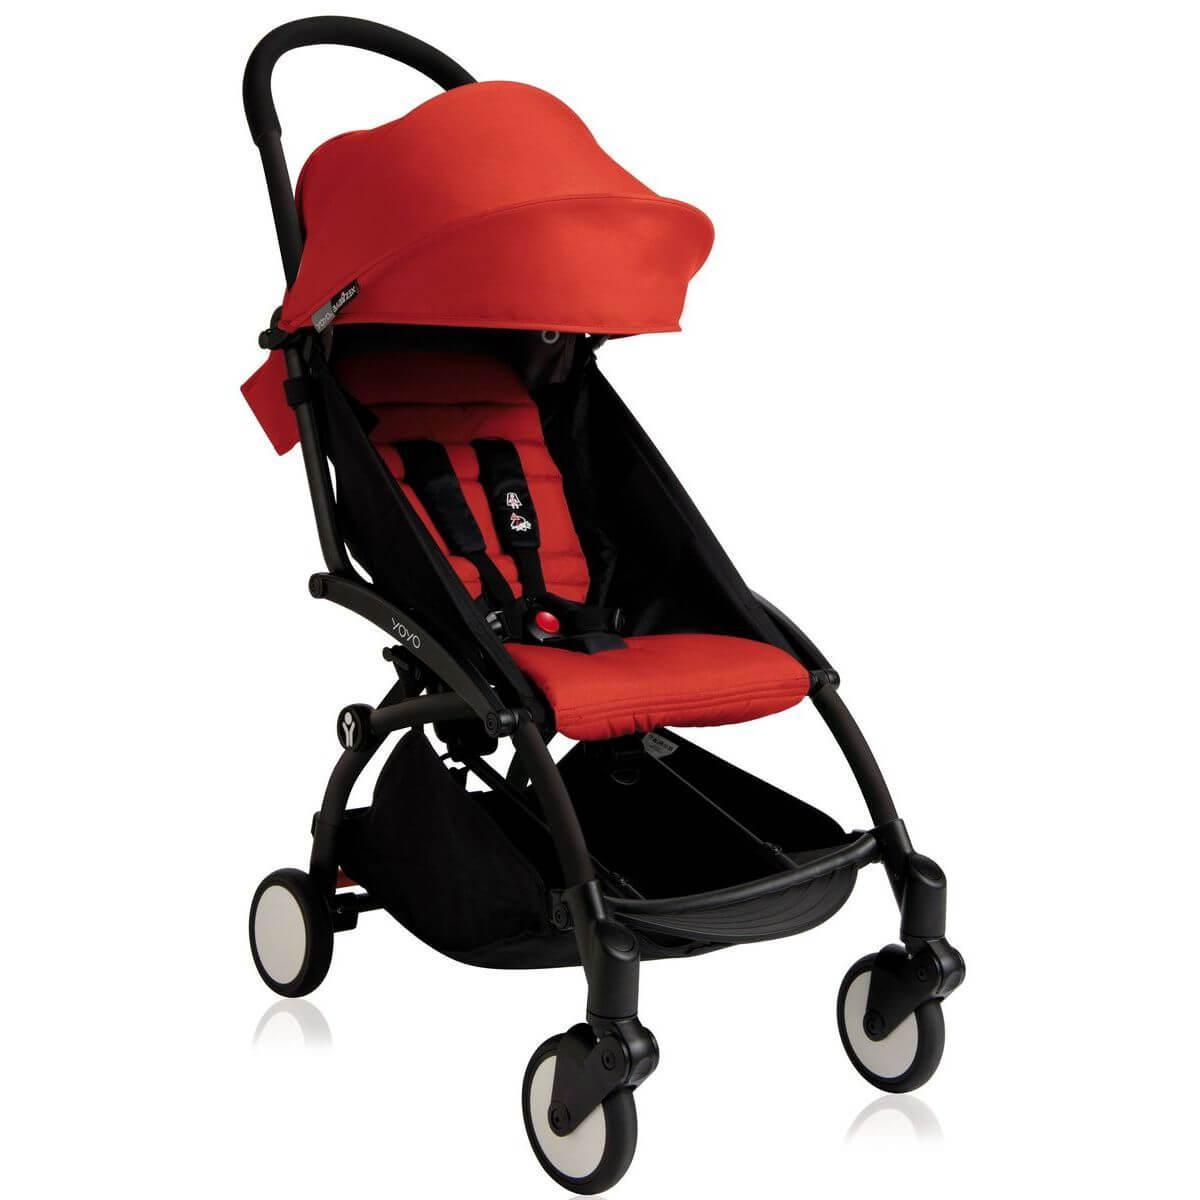 Silla paseo bebé YOYO+ 6+ Babyzen negro-rojo